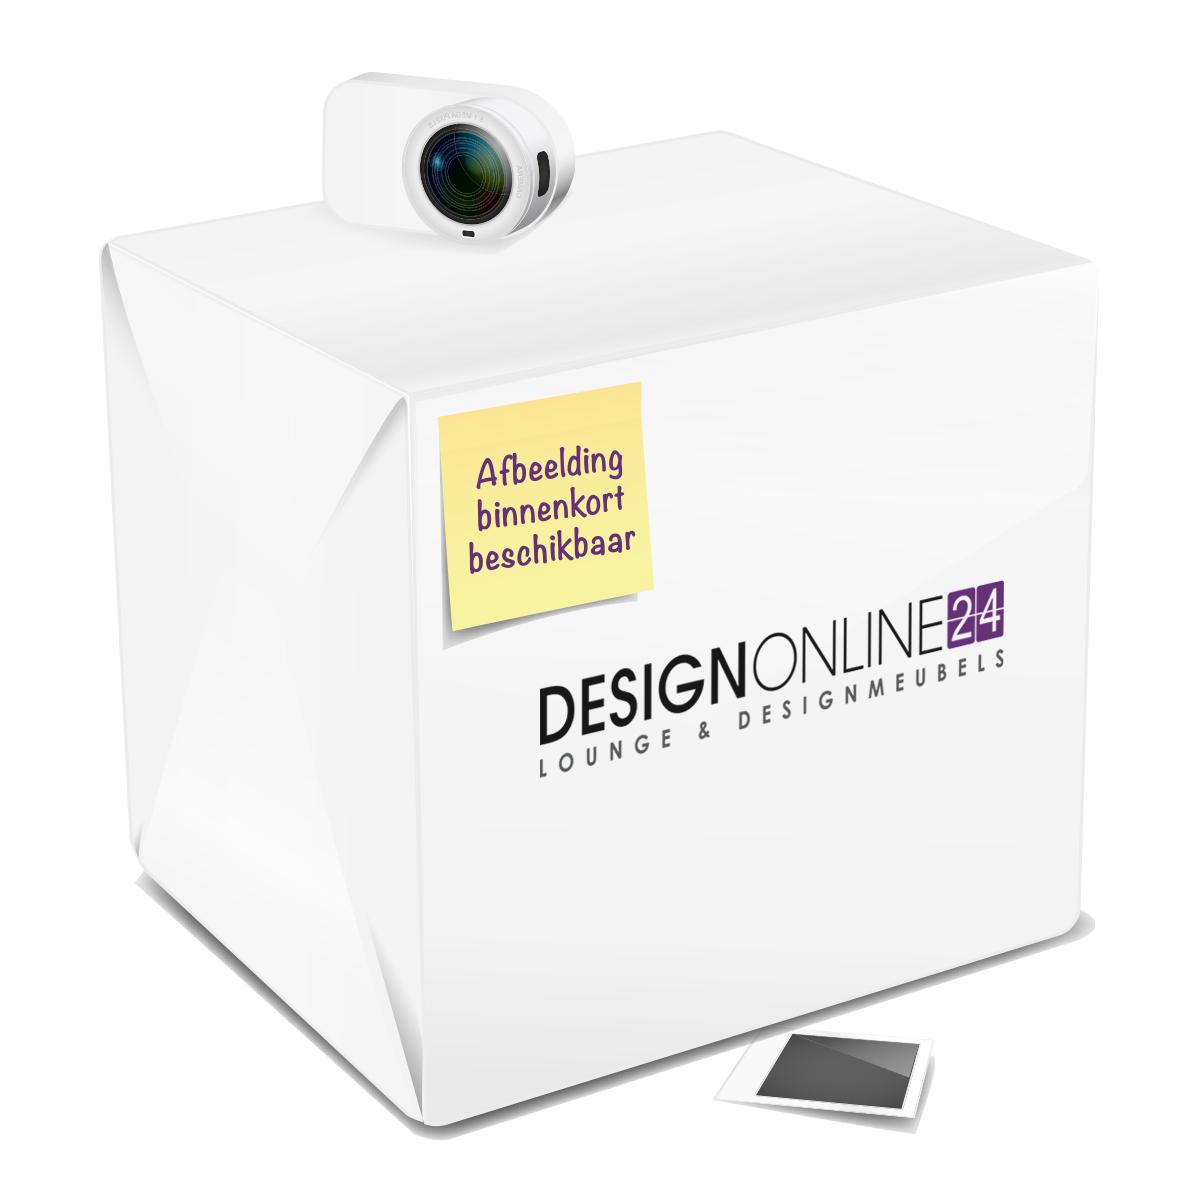 Ronde Tafel Diameter 80 Cm.Ronde Eettafel Direct Leverbaar Designonline24